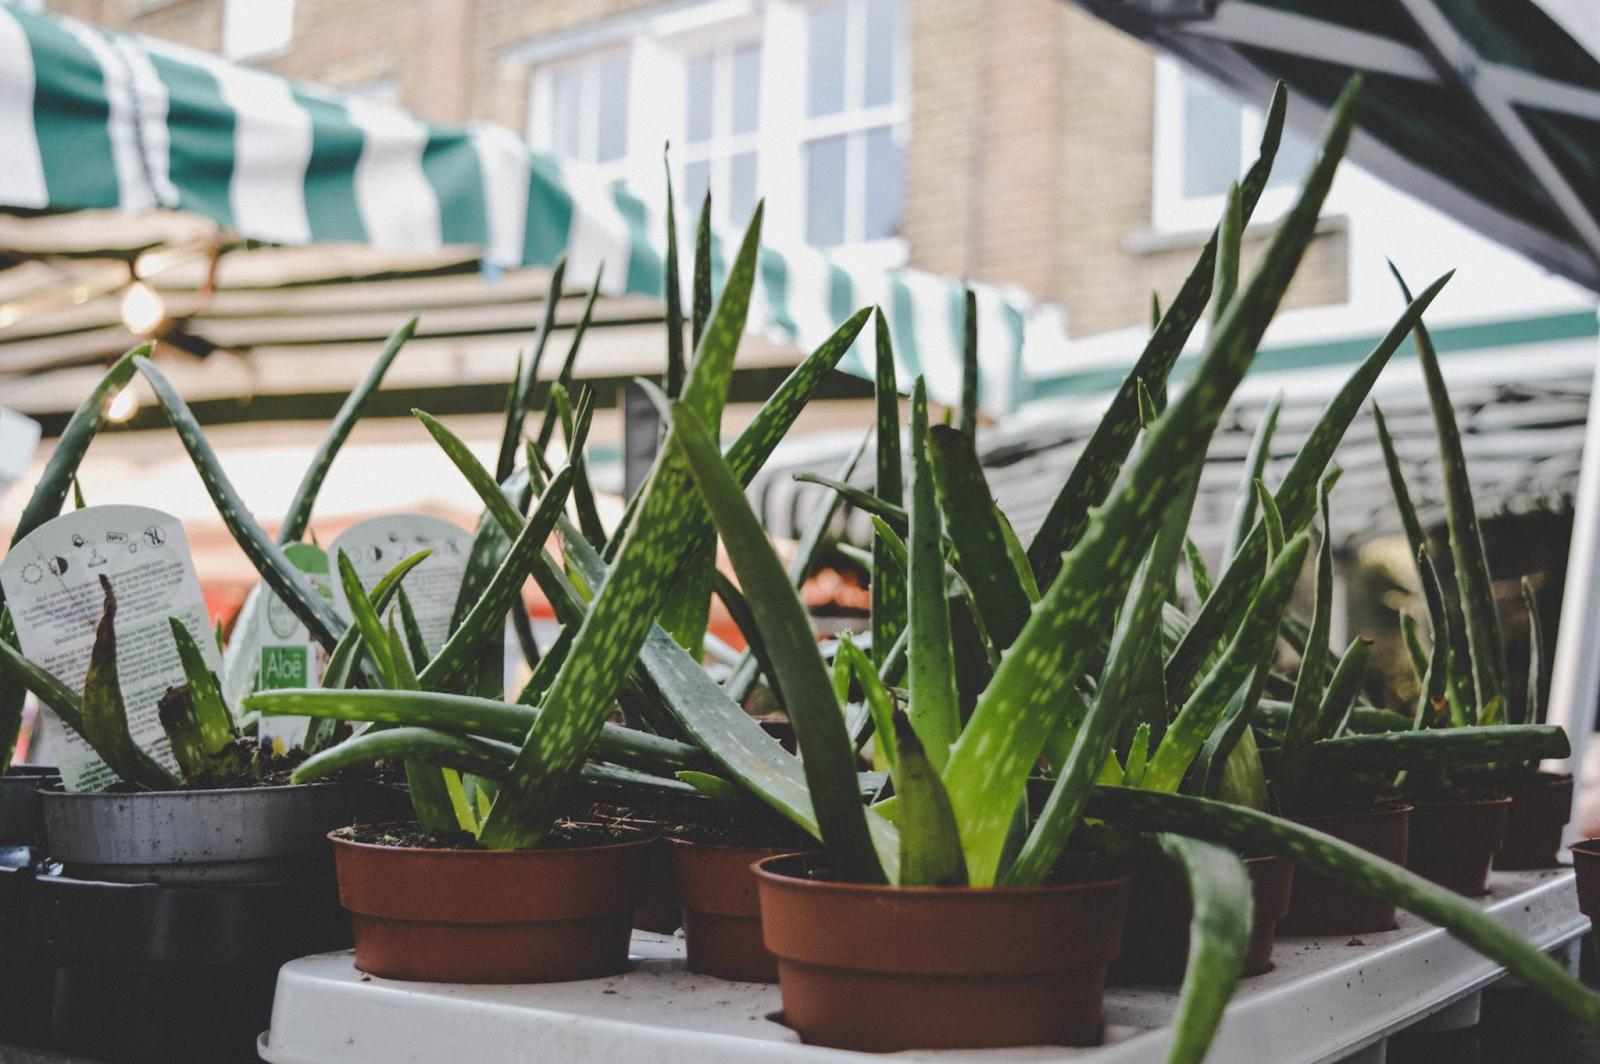 Aloe vera plants, perfect for apartments.